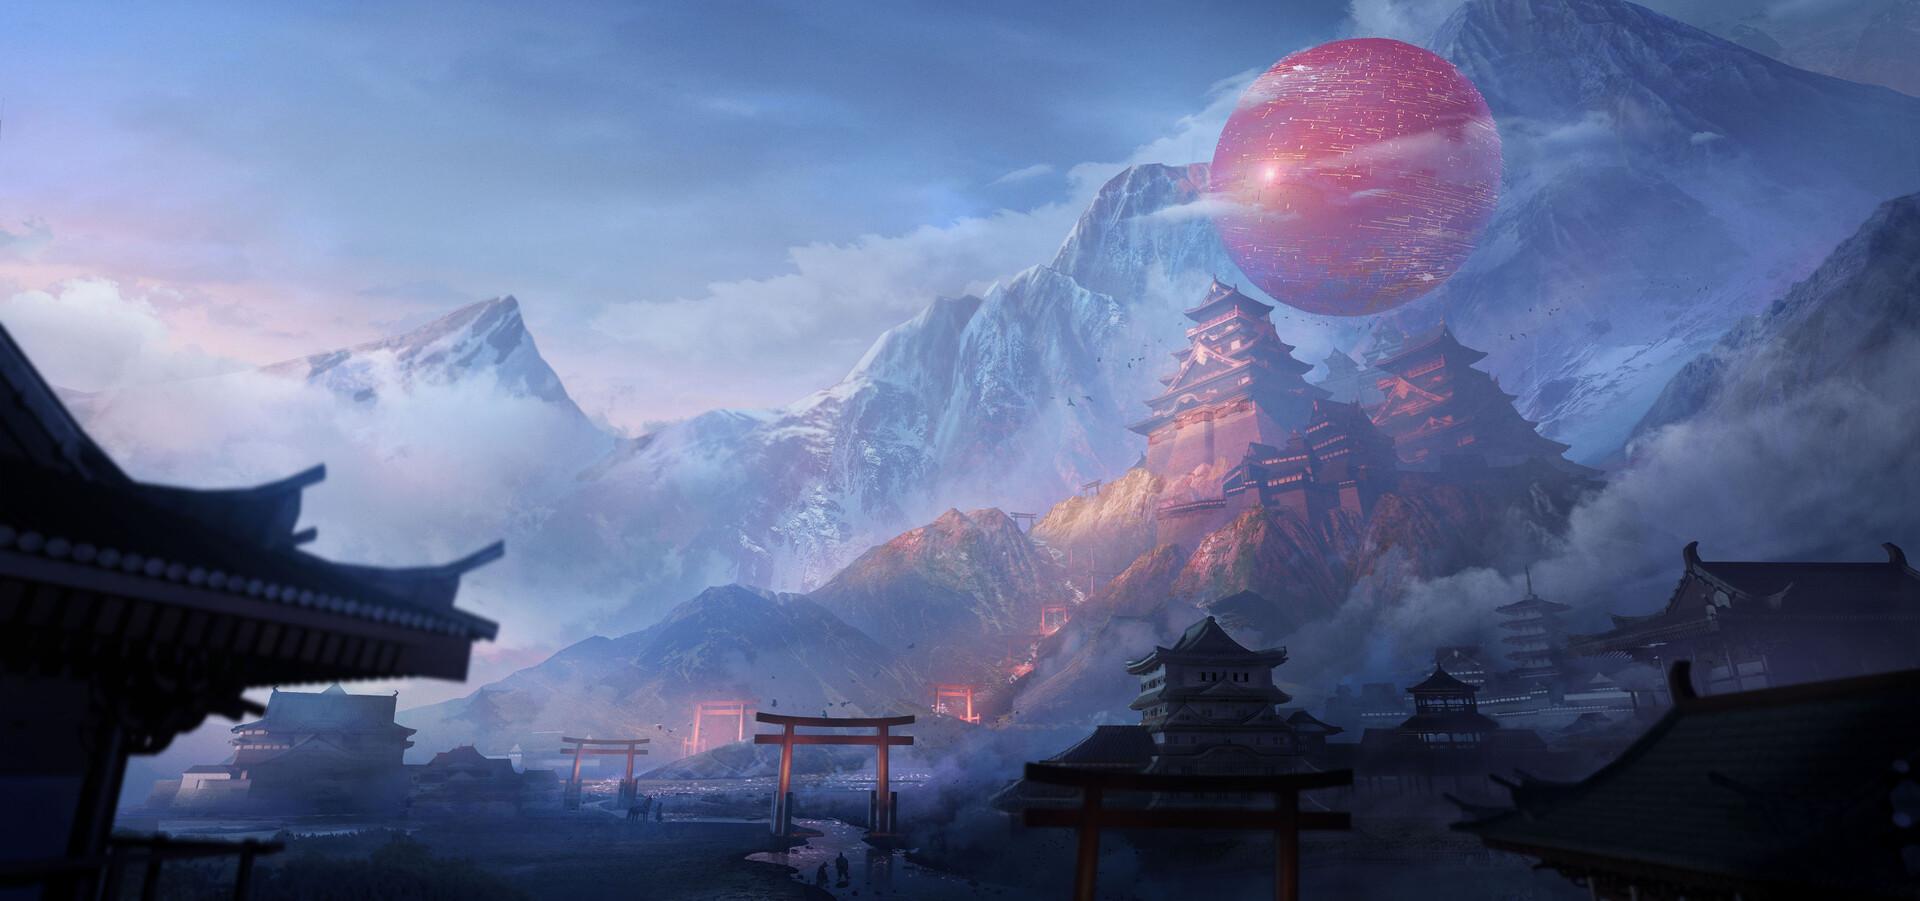 General 1920x901 Asia Yuan Yuan artwork fantasy art ArtStation mountains temple torii shrine river Asian architecture